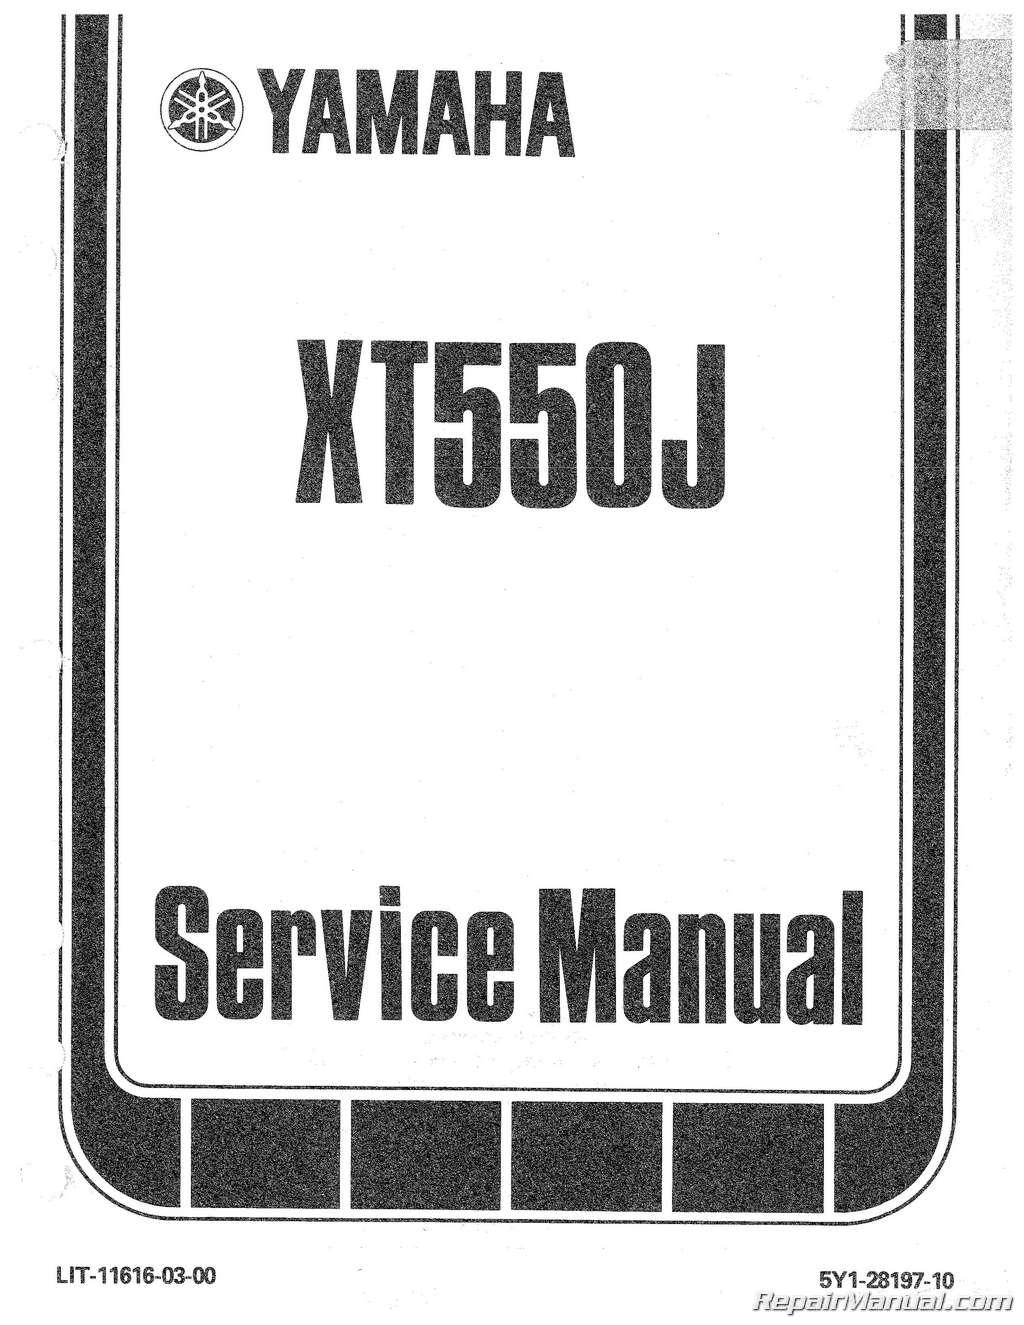 1982 yamaha xt550 motorcycle service repair maintenance